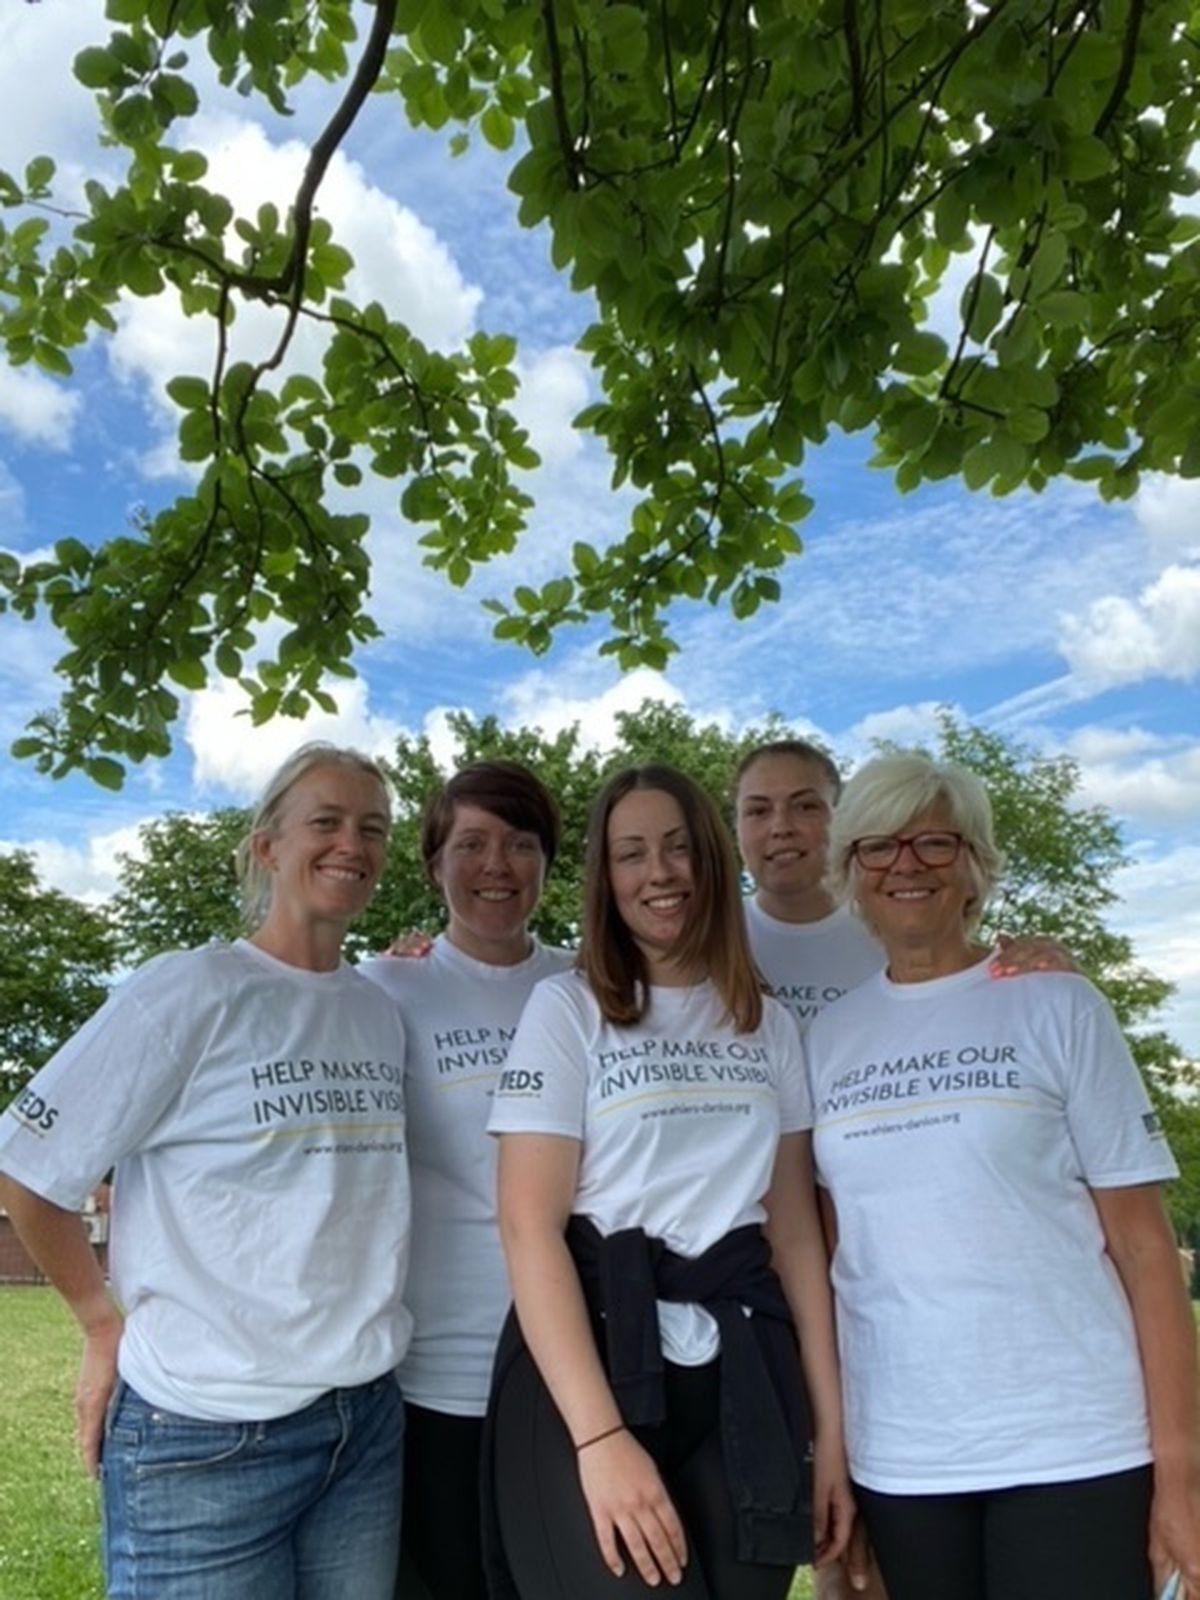 Debbie Havard, Wendy Hillman, Natalie Carr, Rachael Dodd and Jade Dodd are raising money for Ehlers-Danlos Support UK